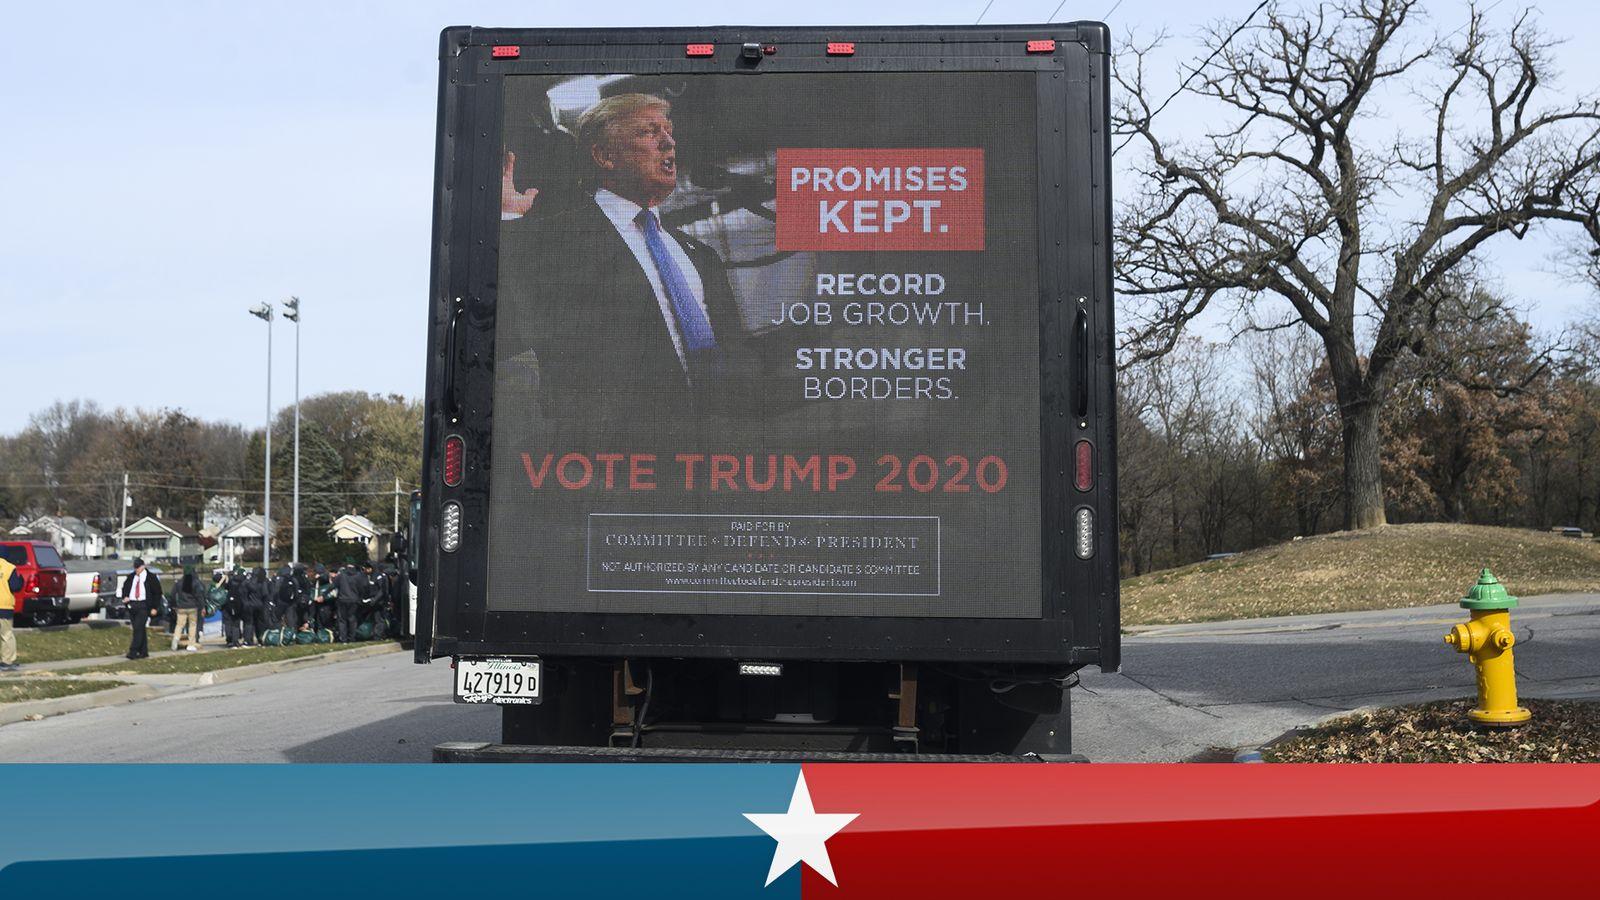 Us Election 2020 Biden Has Big Cash Advantage Over Trump As Race Enters Final Stretch Us News Sky News